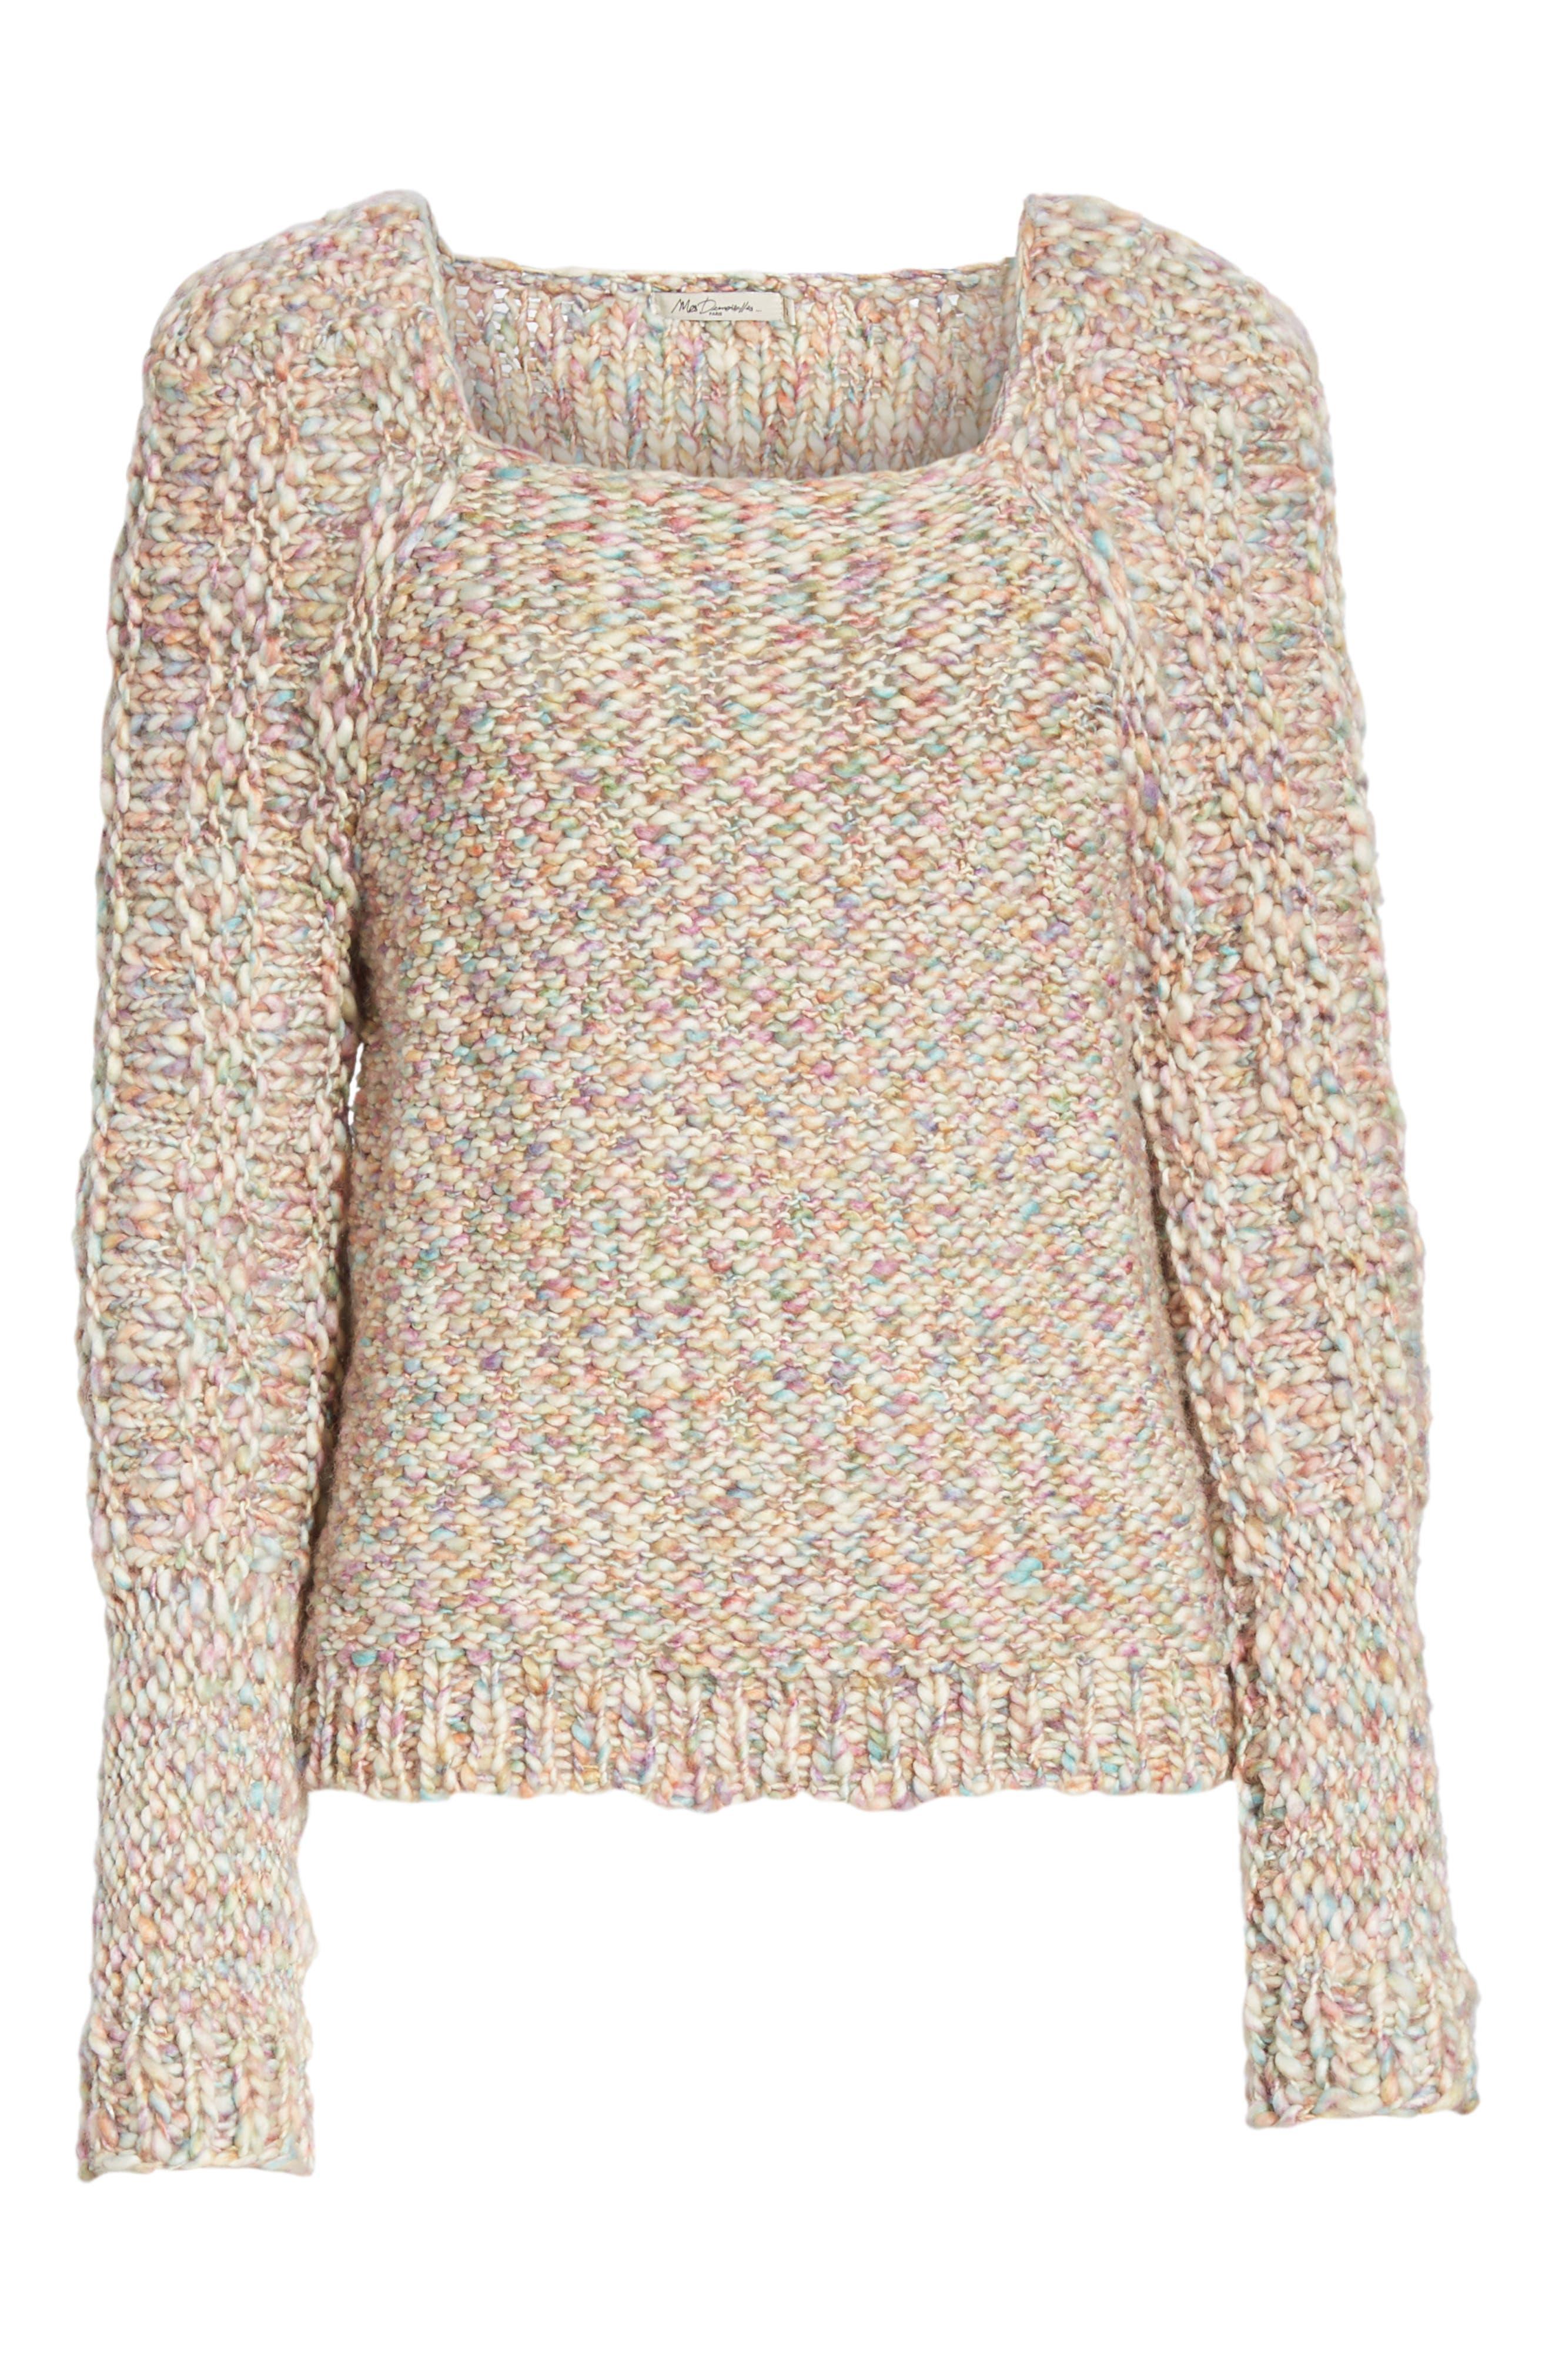 Joplin Wool Sweater,                             Alternate thumbnail 6, color,                             PASTEL MULTI